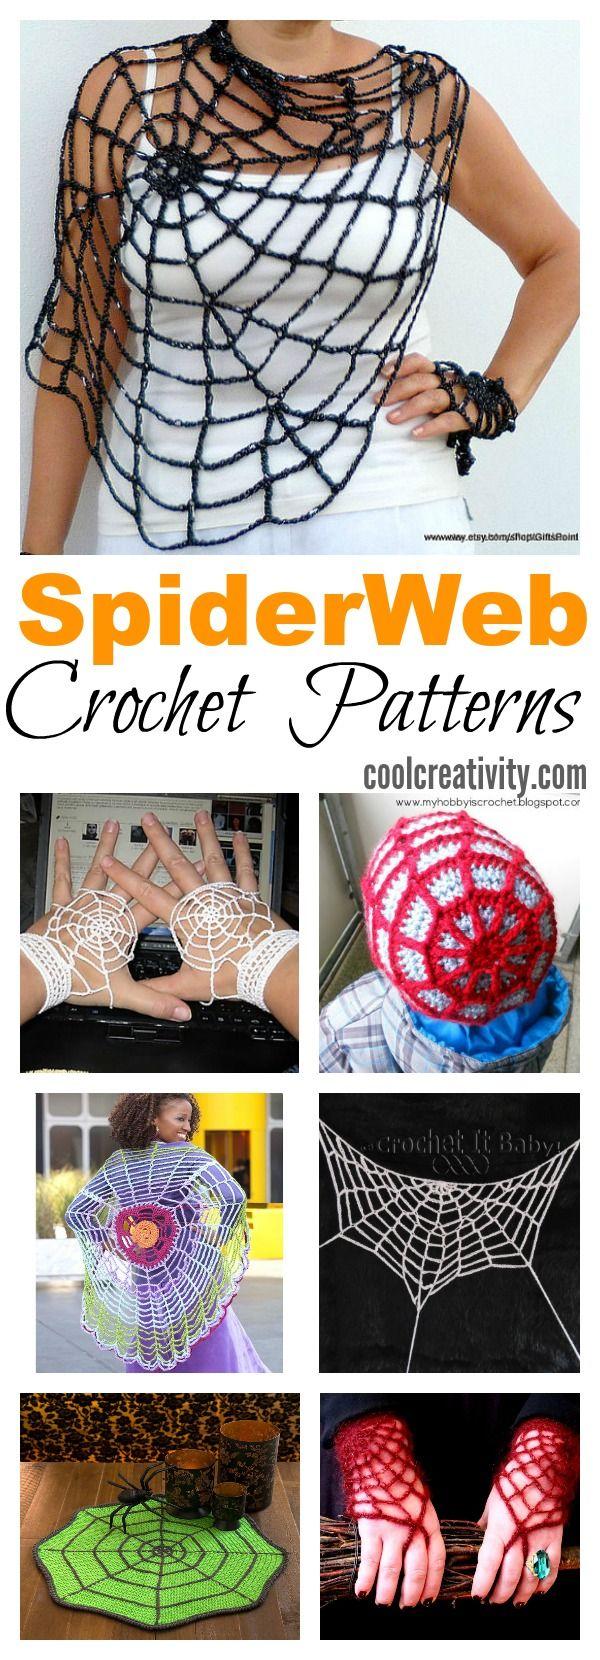 Crochet SpiderWeb Patterns | crochet | Pinterest | Häkeln ...